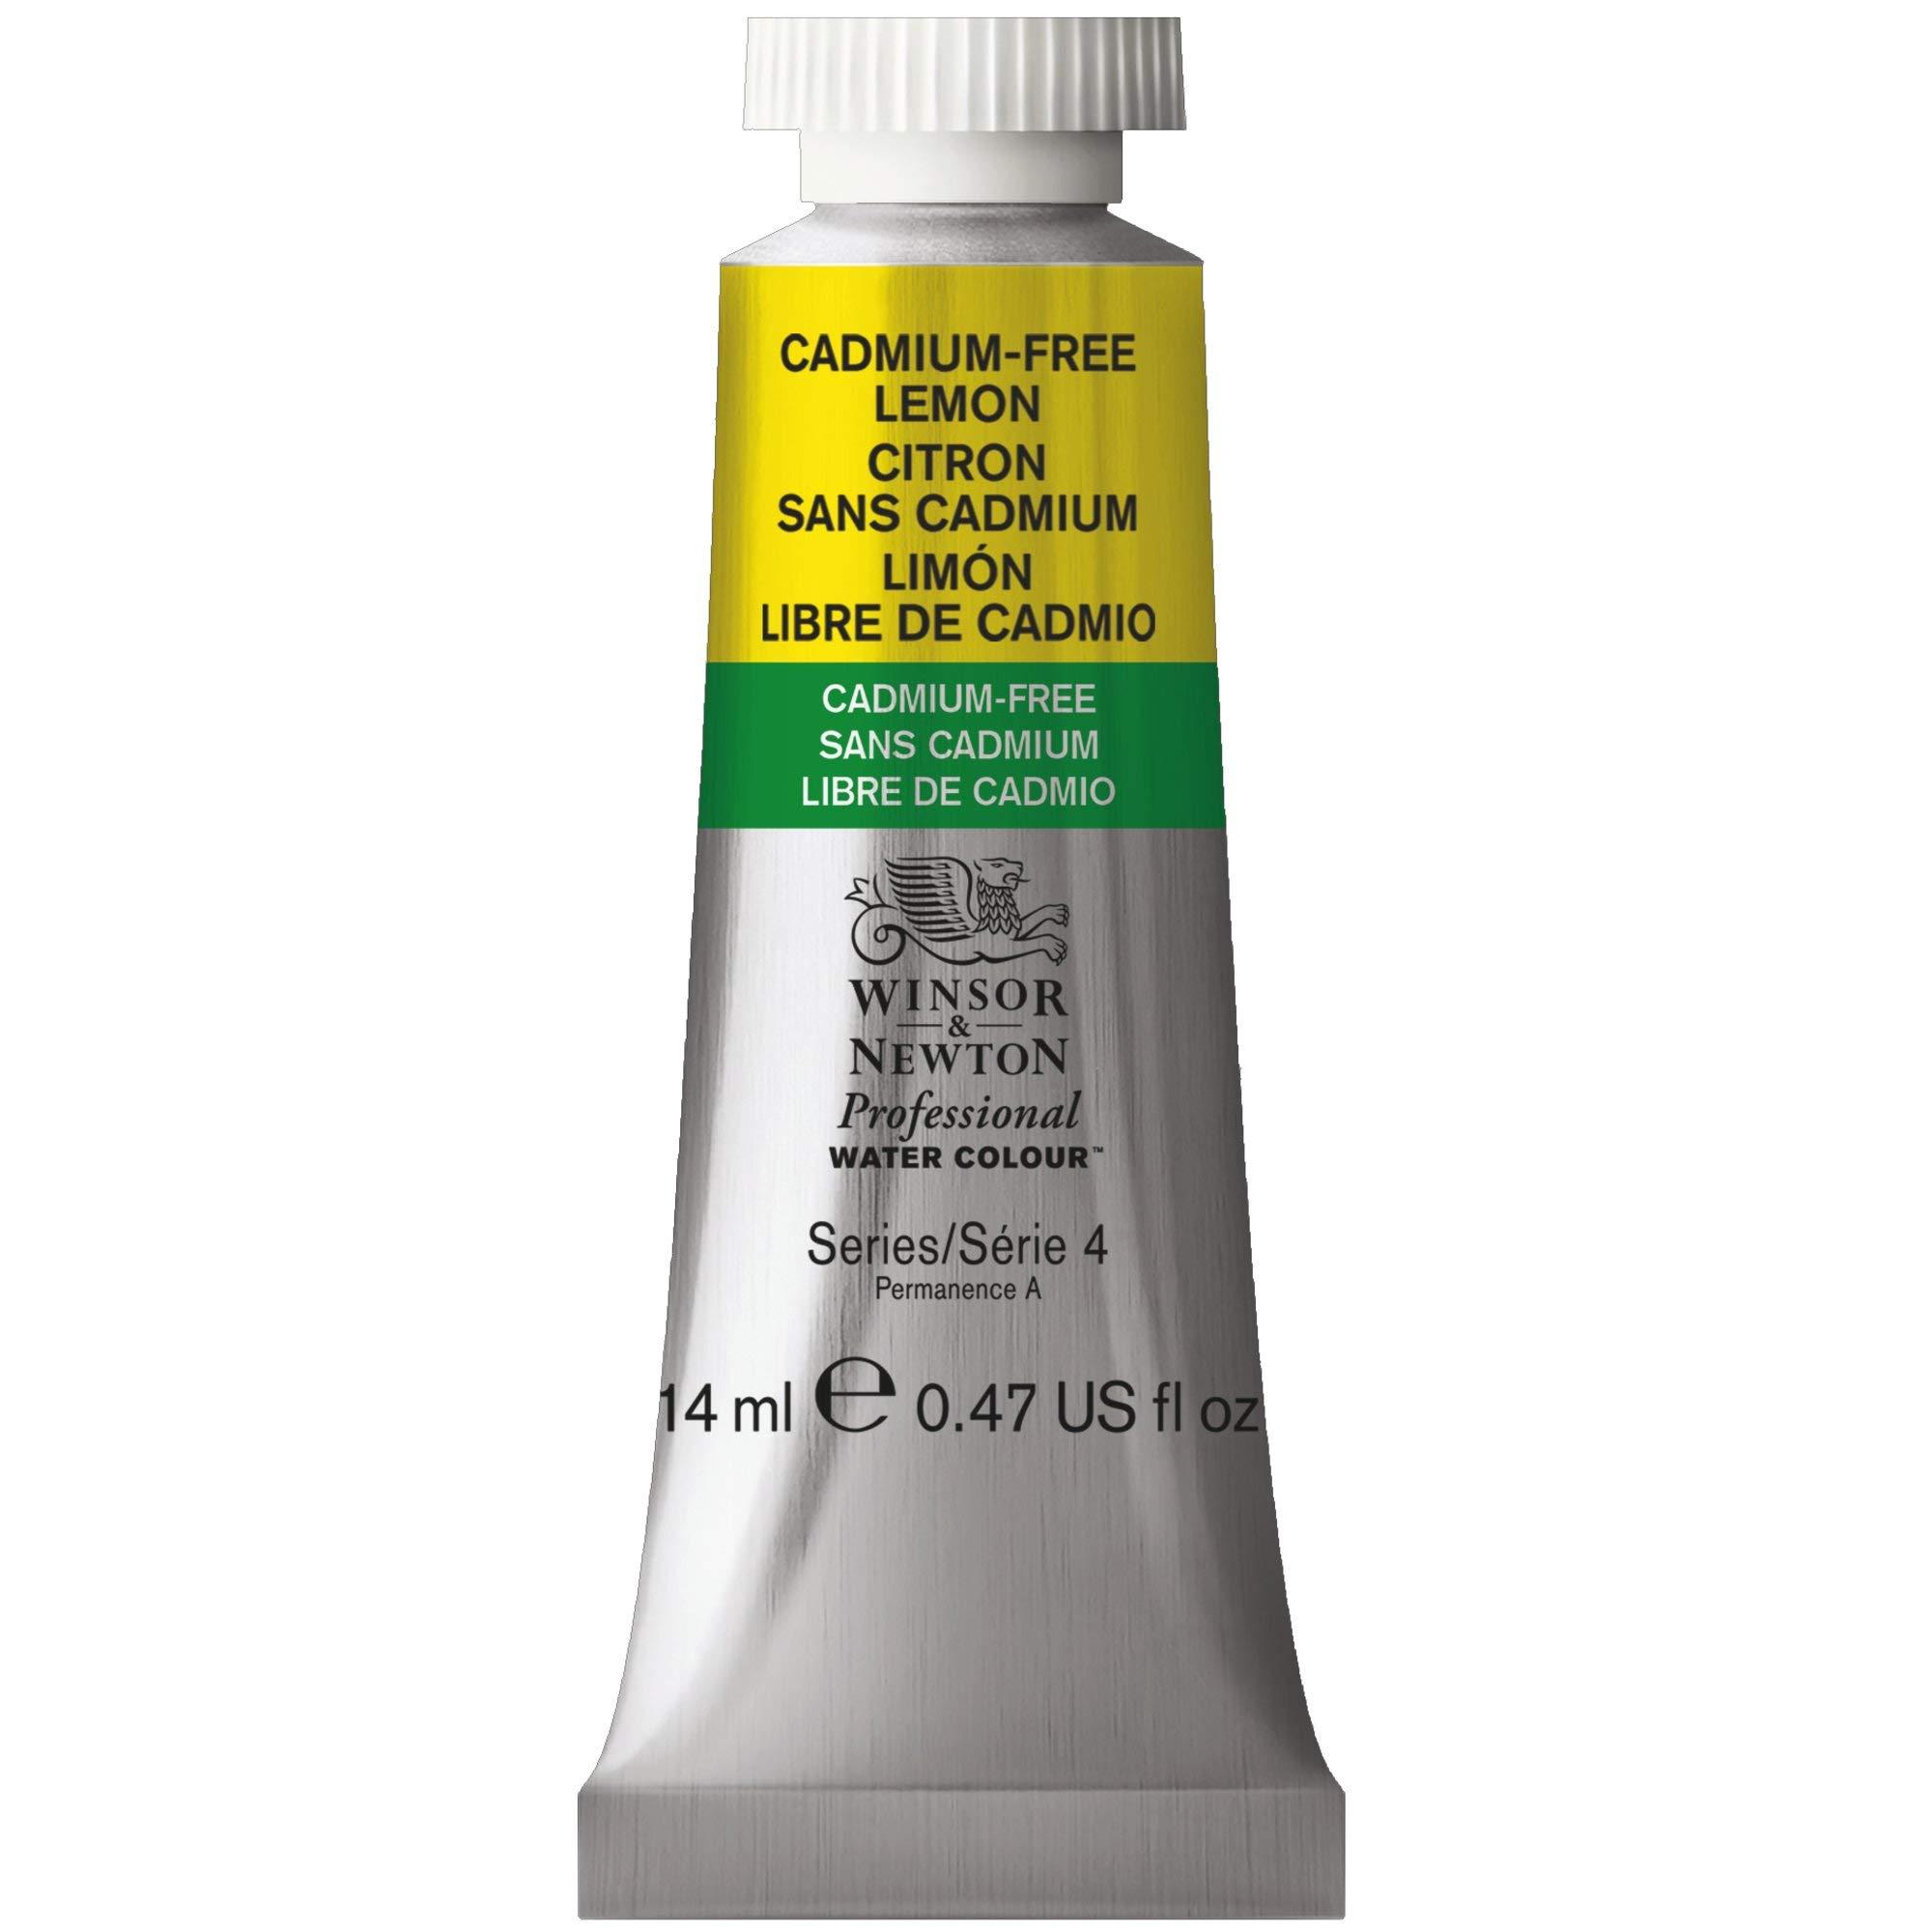 Winsor & Newton Professional Water Colour Paint, 14ml tube, Cadmium-Free Lemon